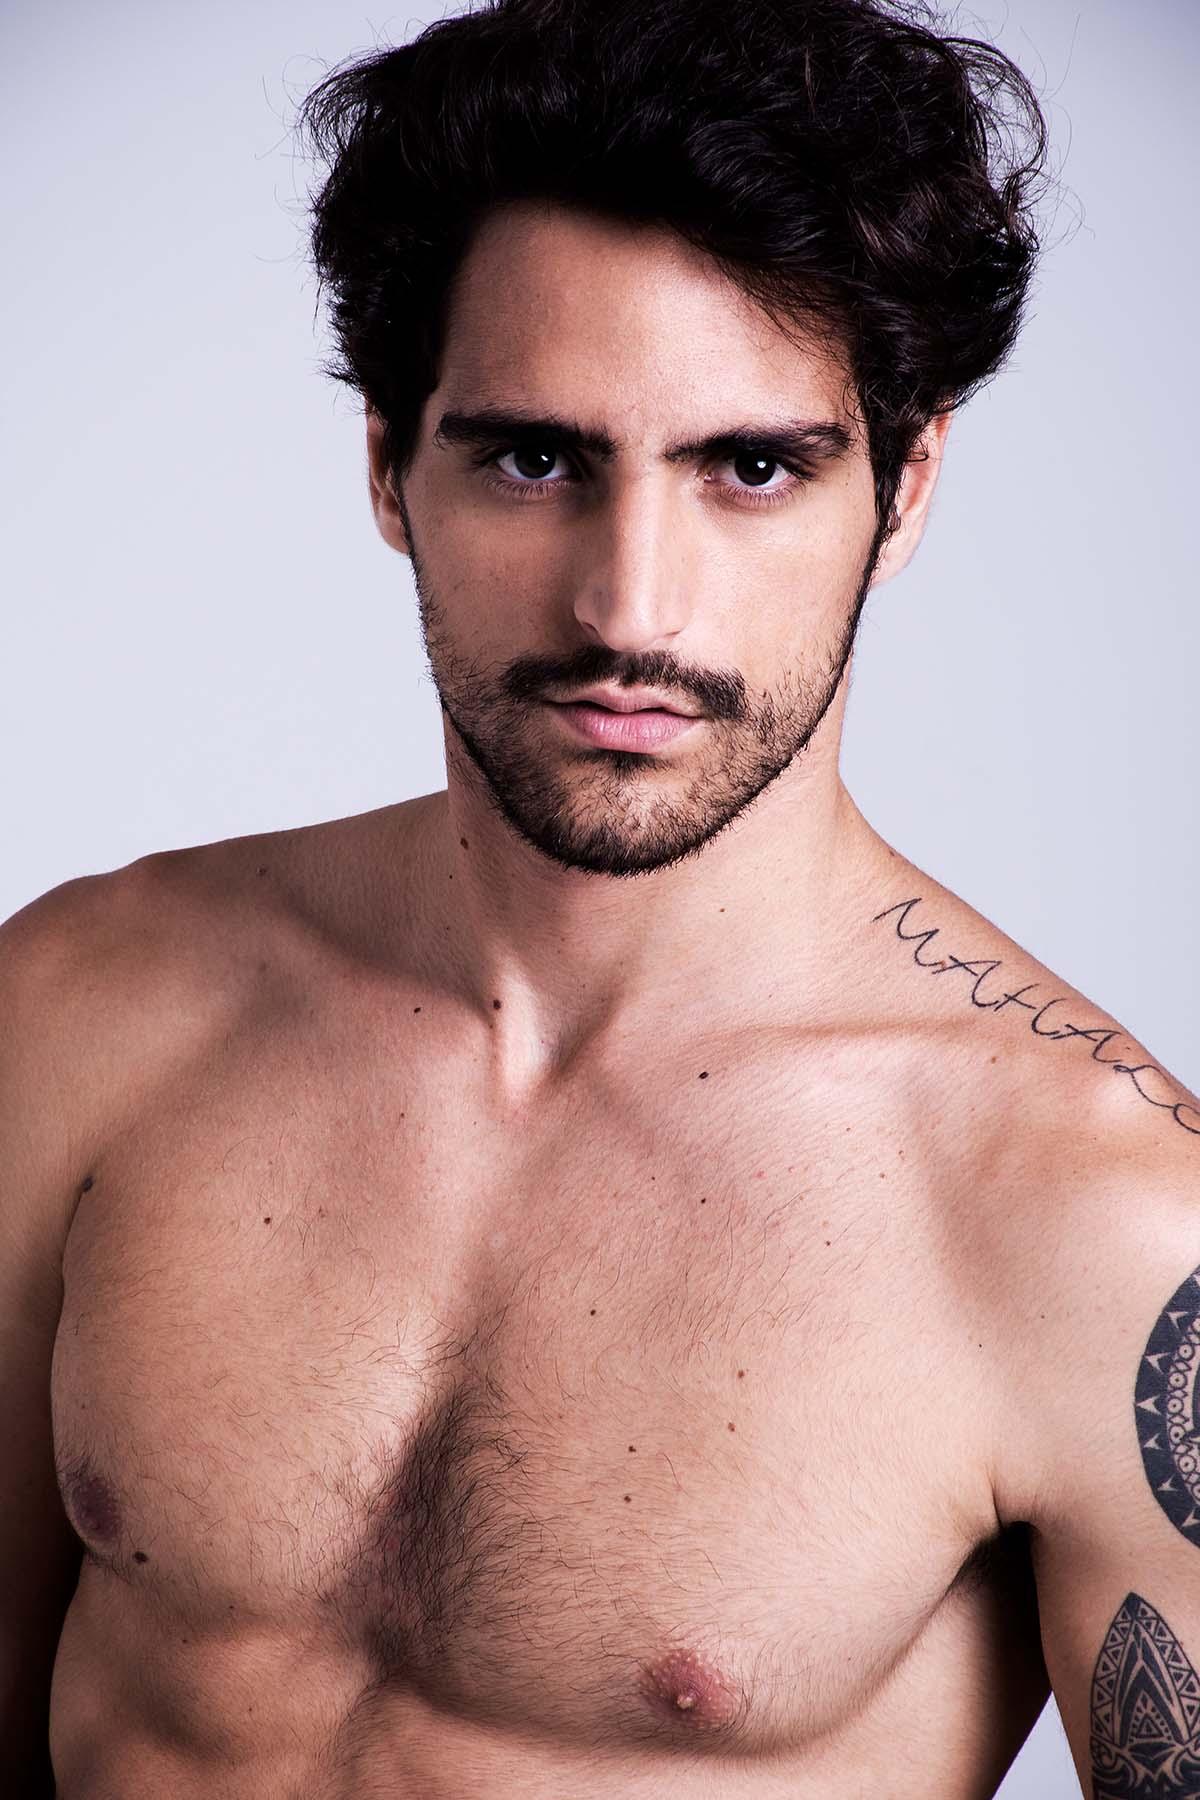 Lucas Teixeira by Olavo Martins for Brazilian Male Model